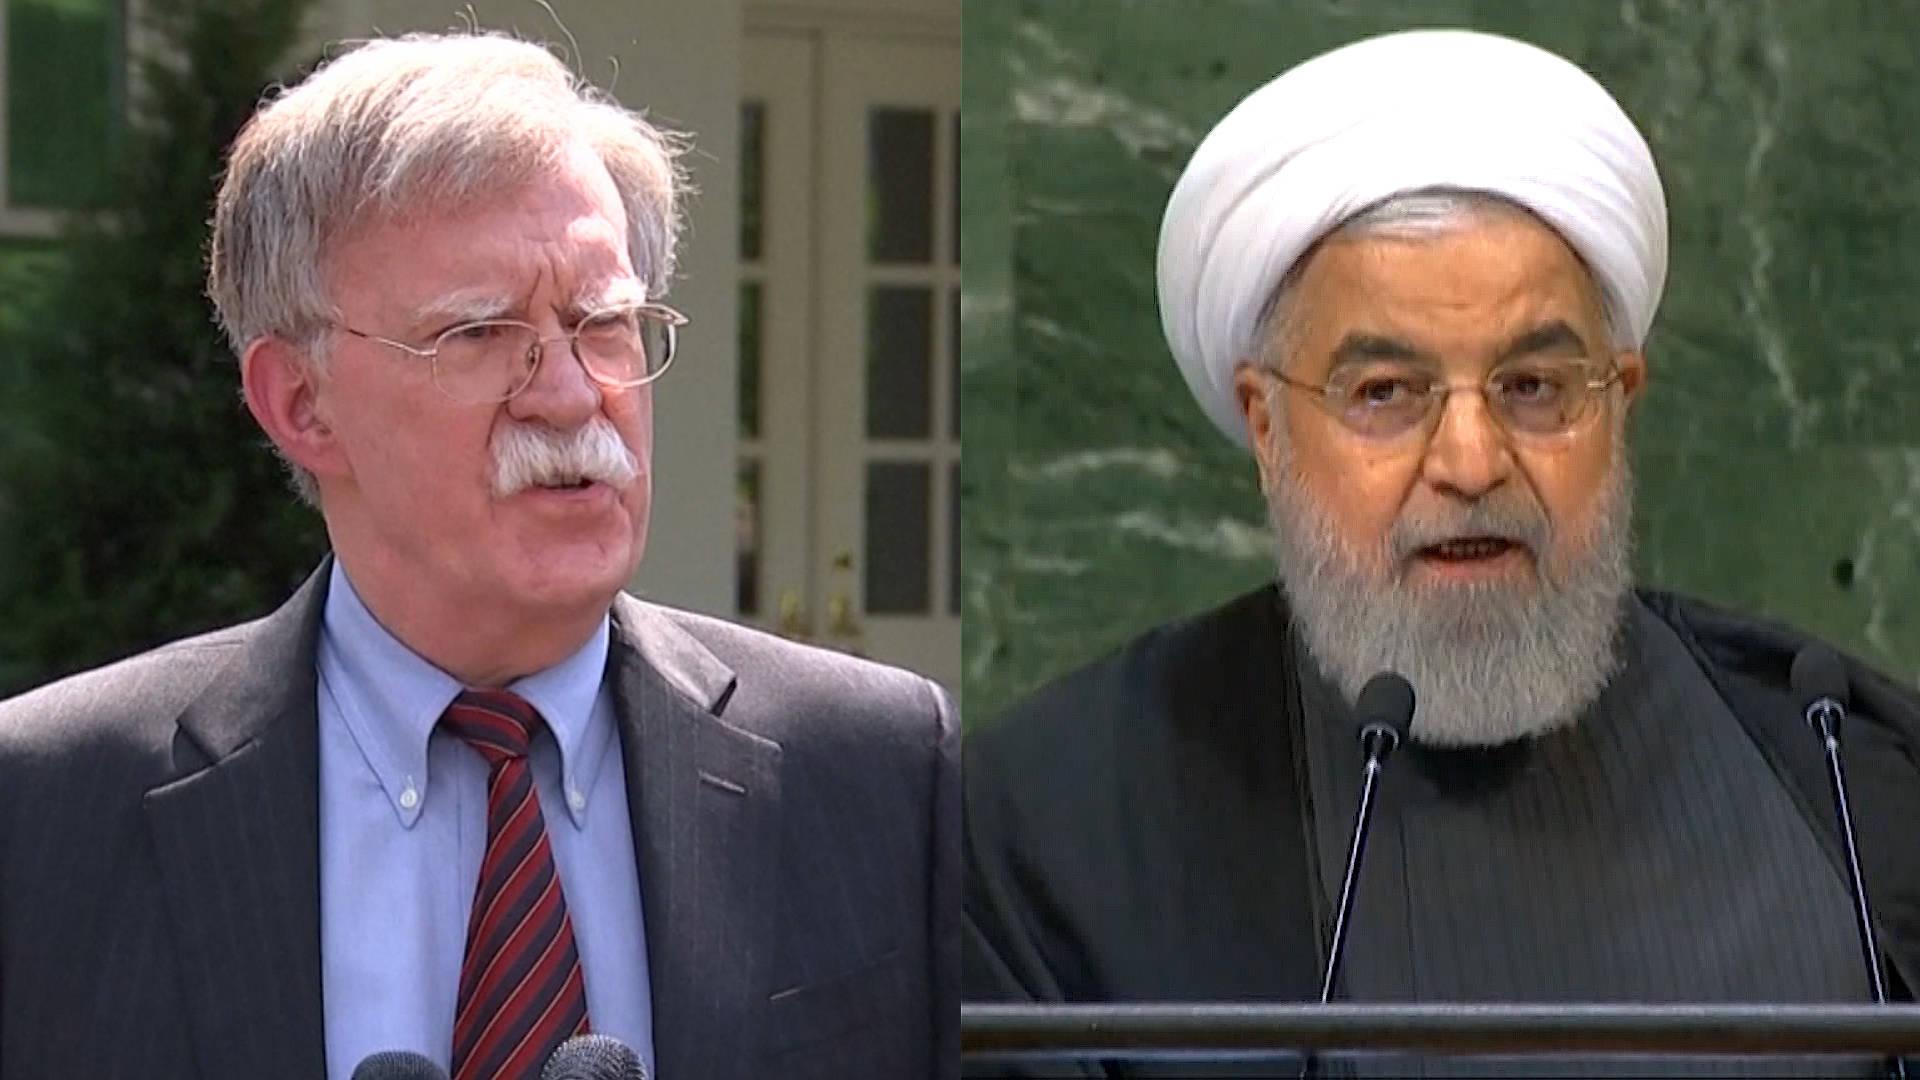 photo image Will John Bolton's Dream to Bomb Iran Come True? Ex-Iranian Ambassador Warns About U.S. Escalation